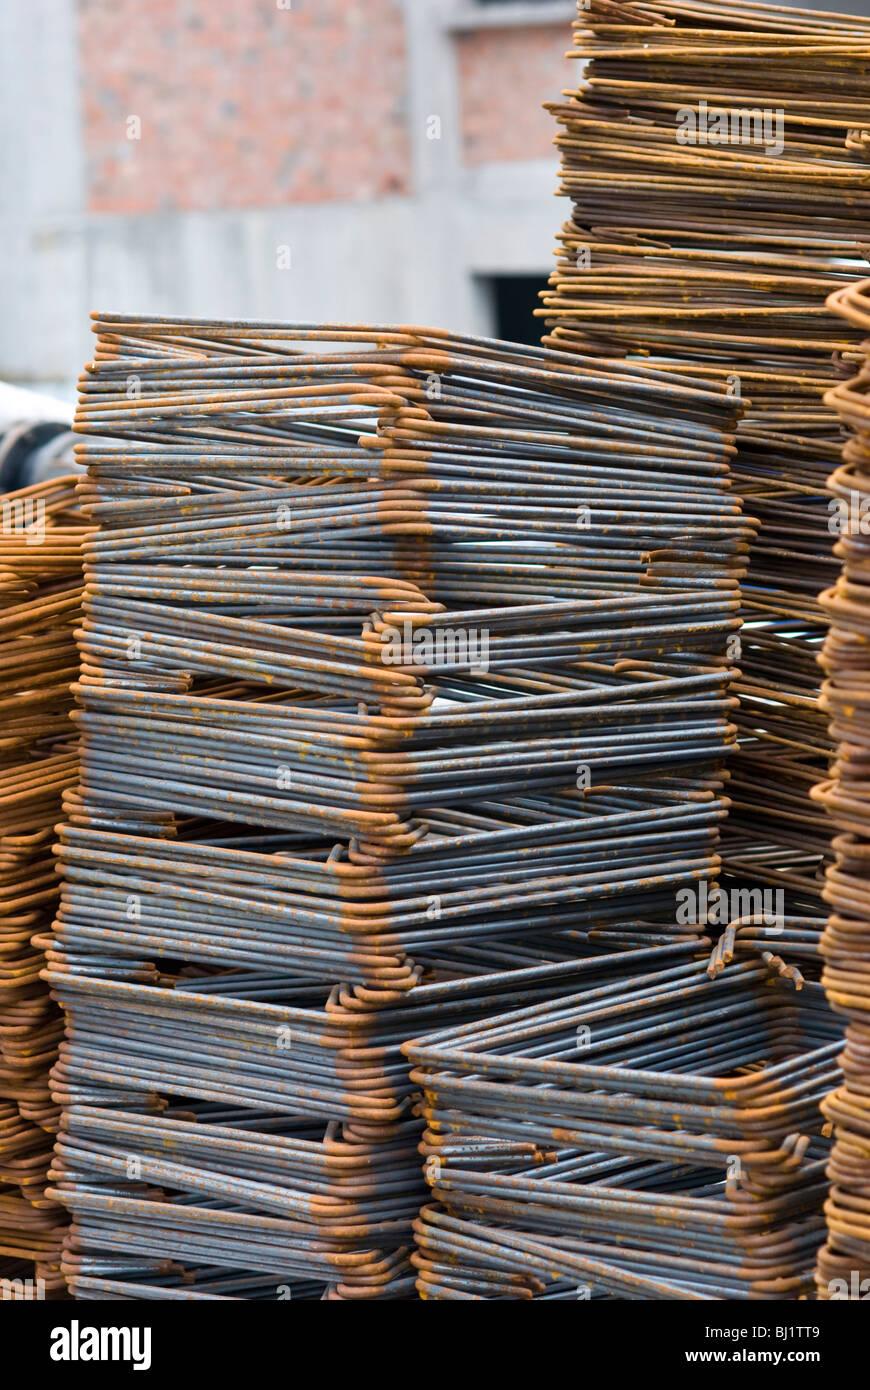 Close-up of Rusty High Tensile Deformed Steel Bar - Stock Image